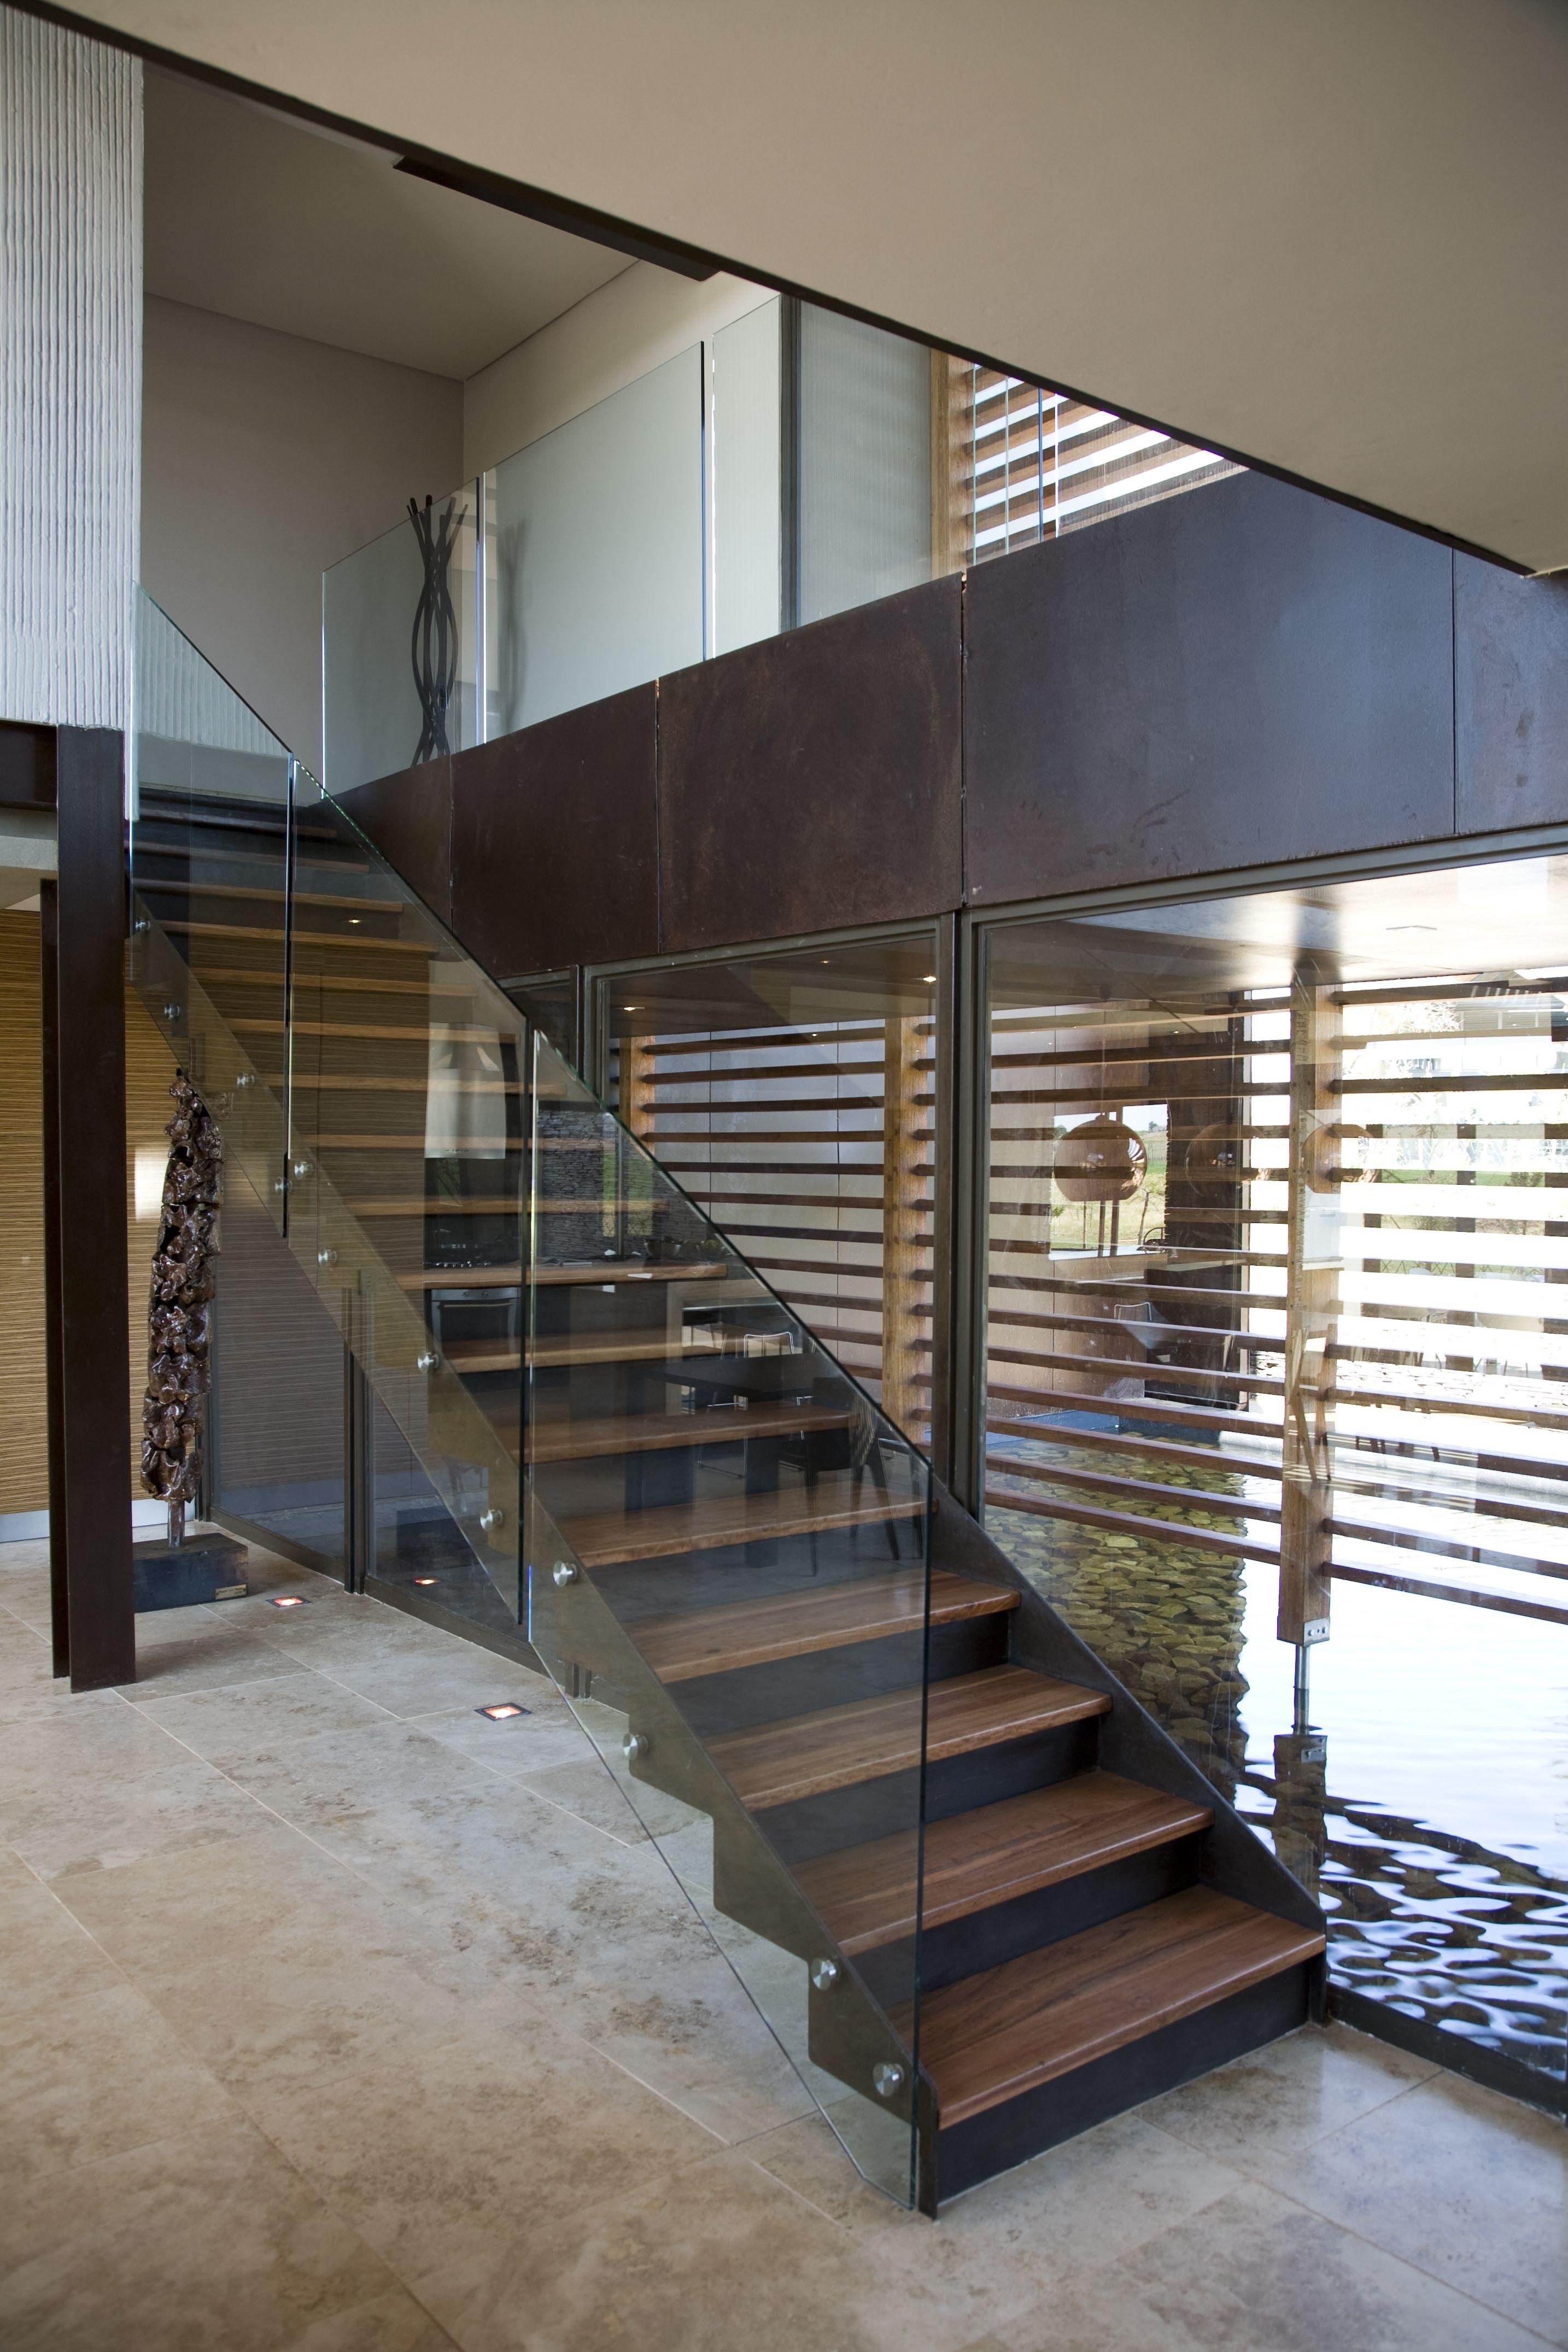 House Serengeti - Timer Staircase - Nico Van Der Meulen